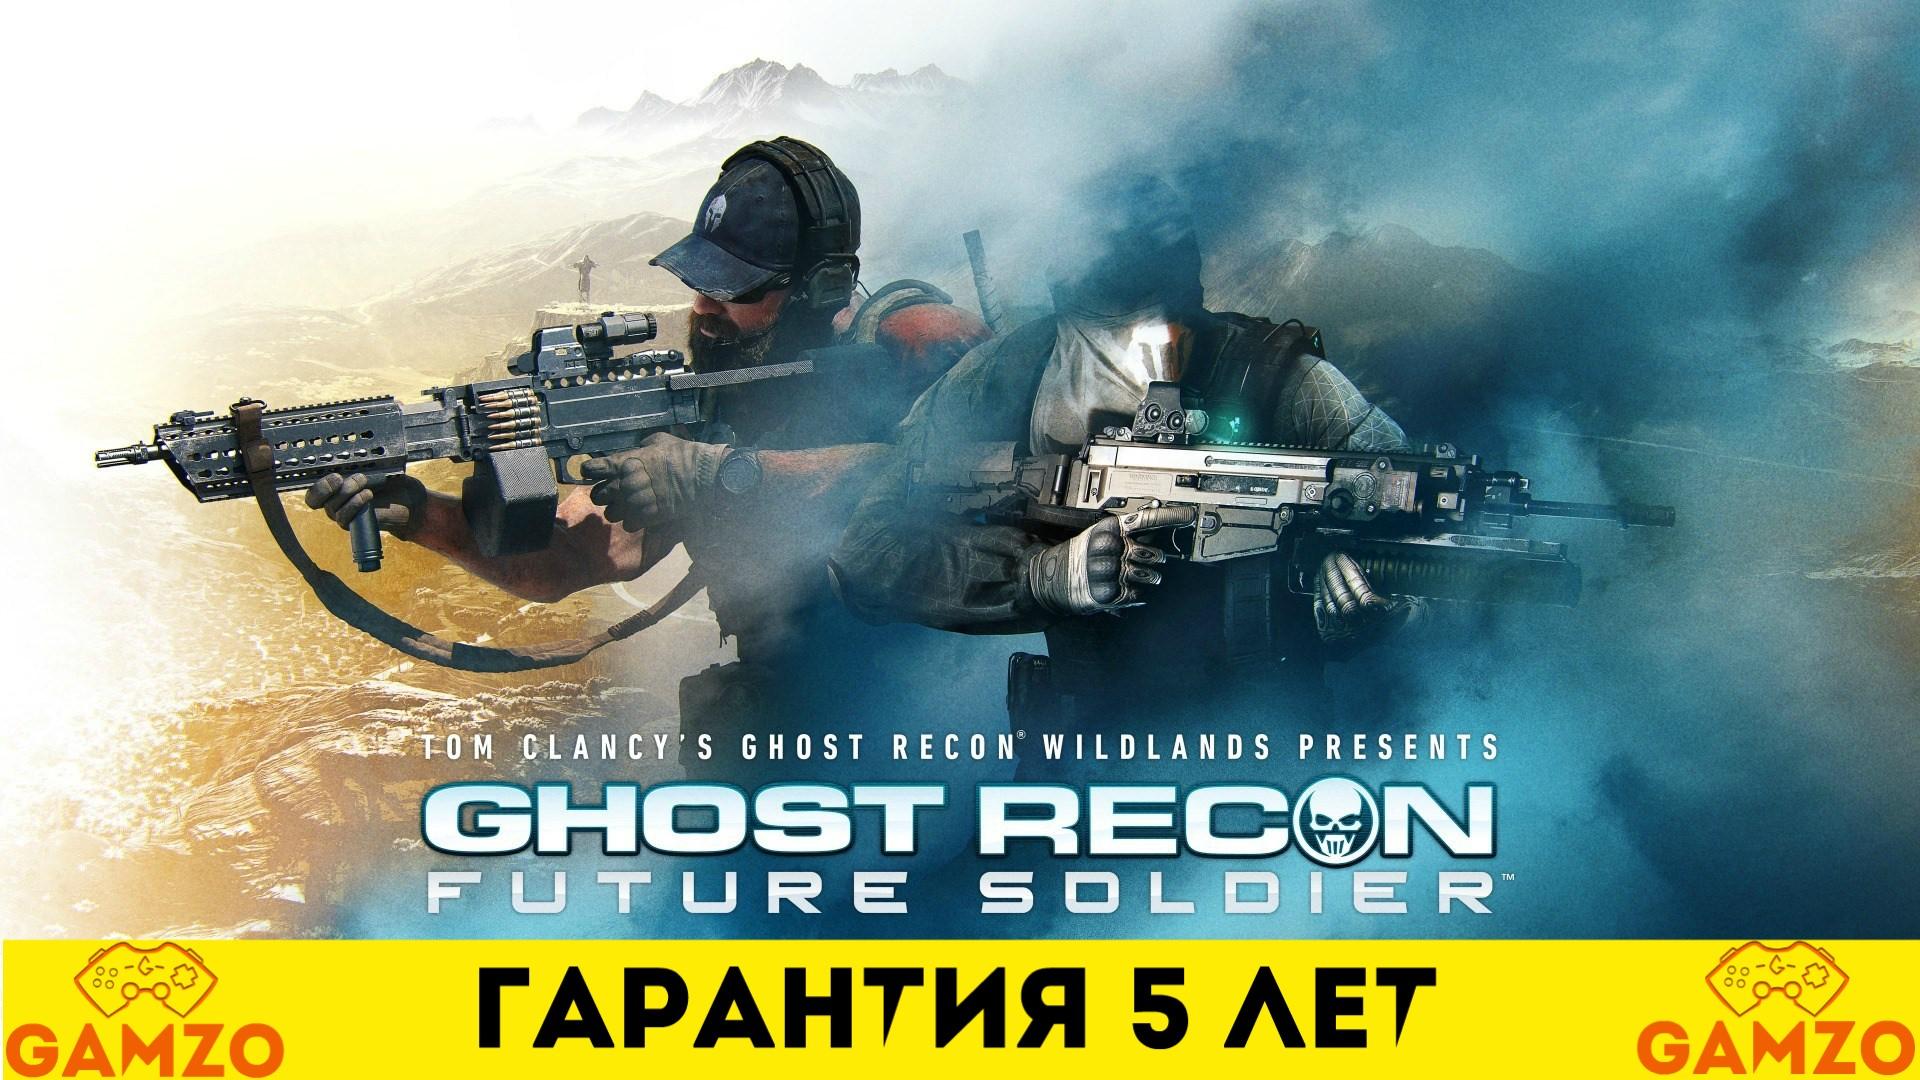 Ghost Recon: Future Soldier [Гарантия 5 лет] + Подарок